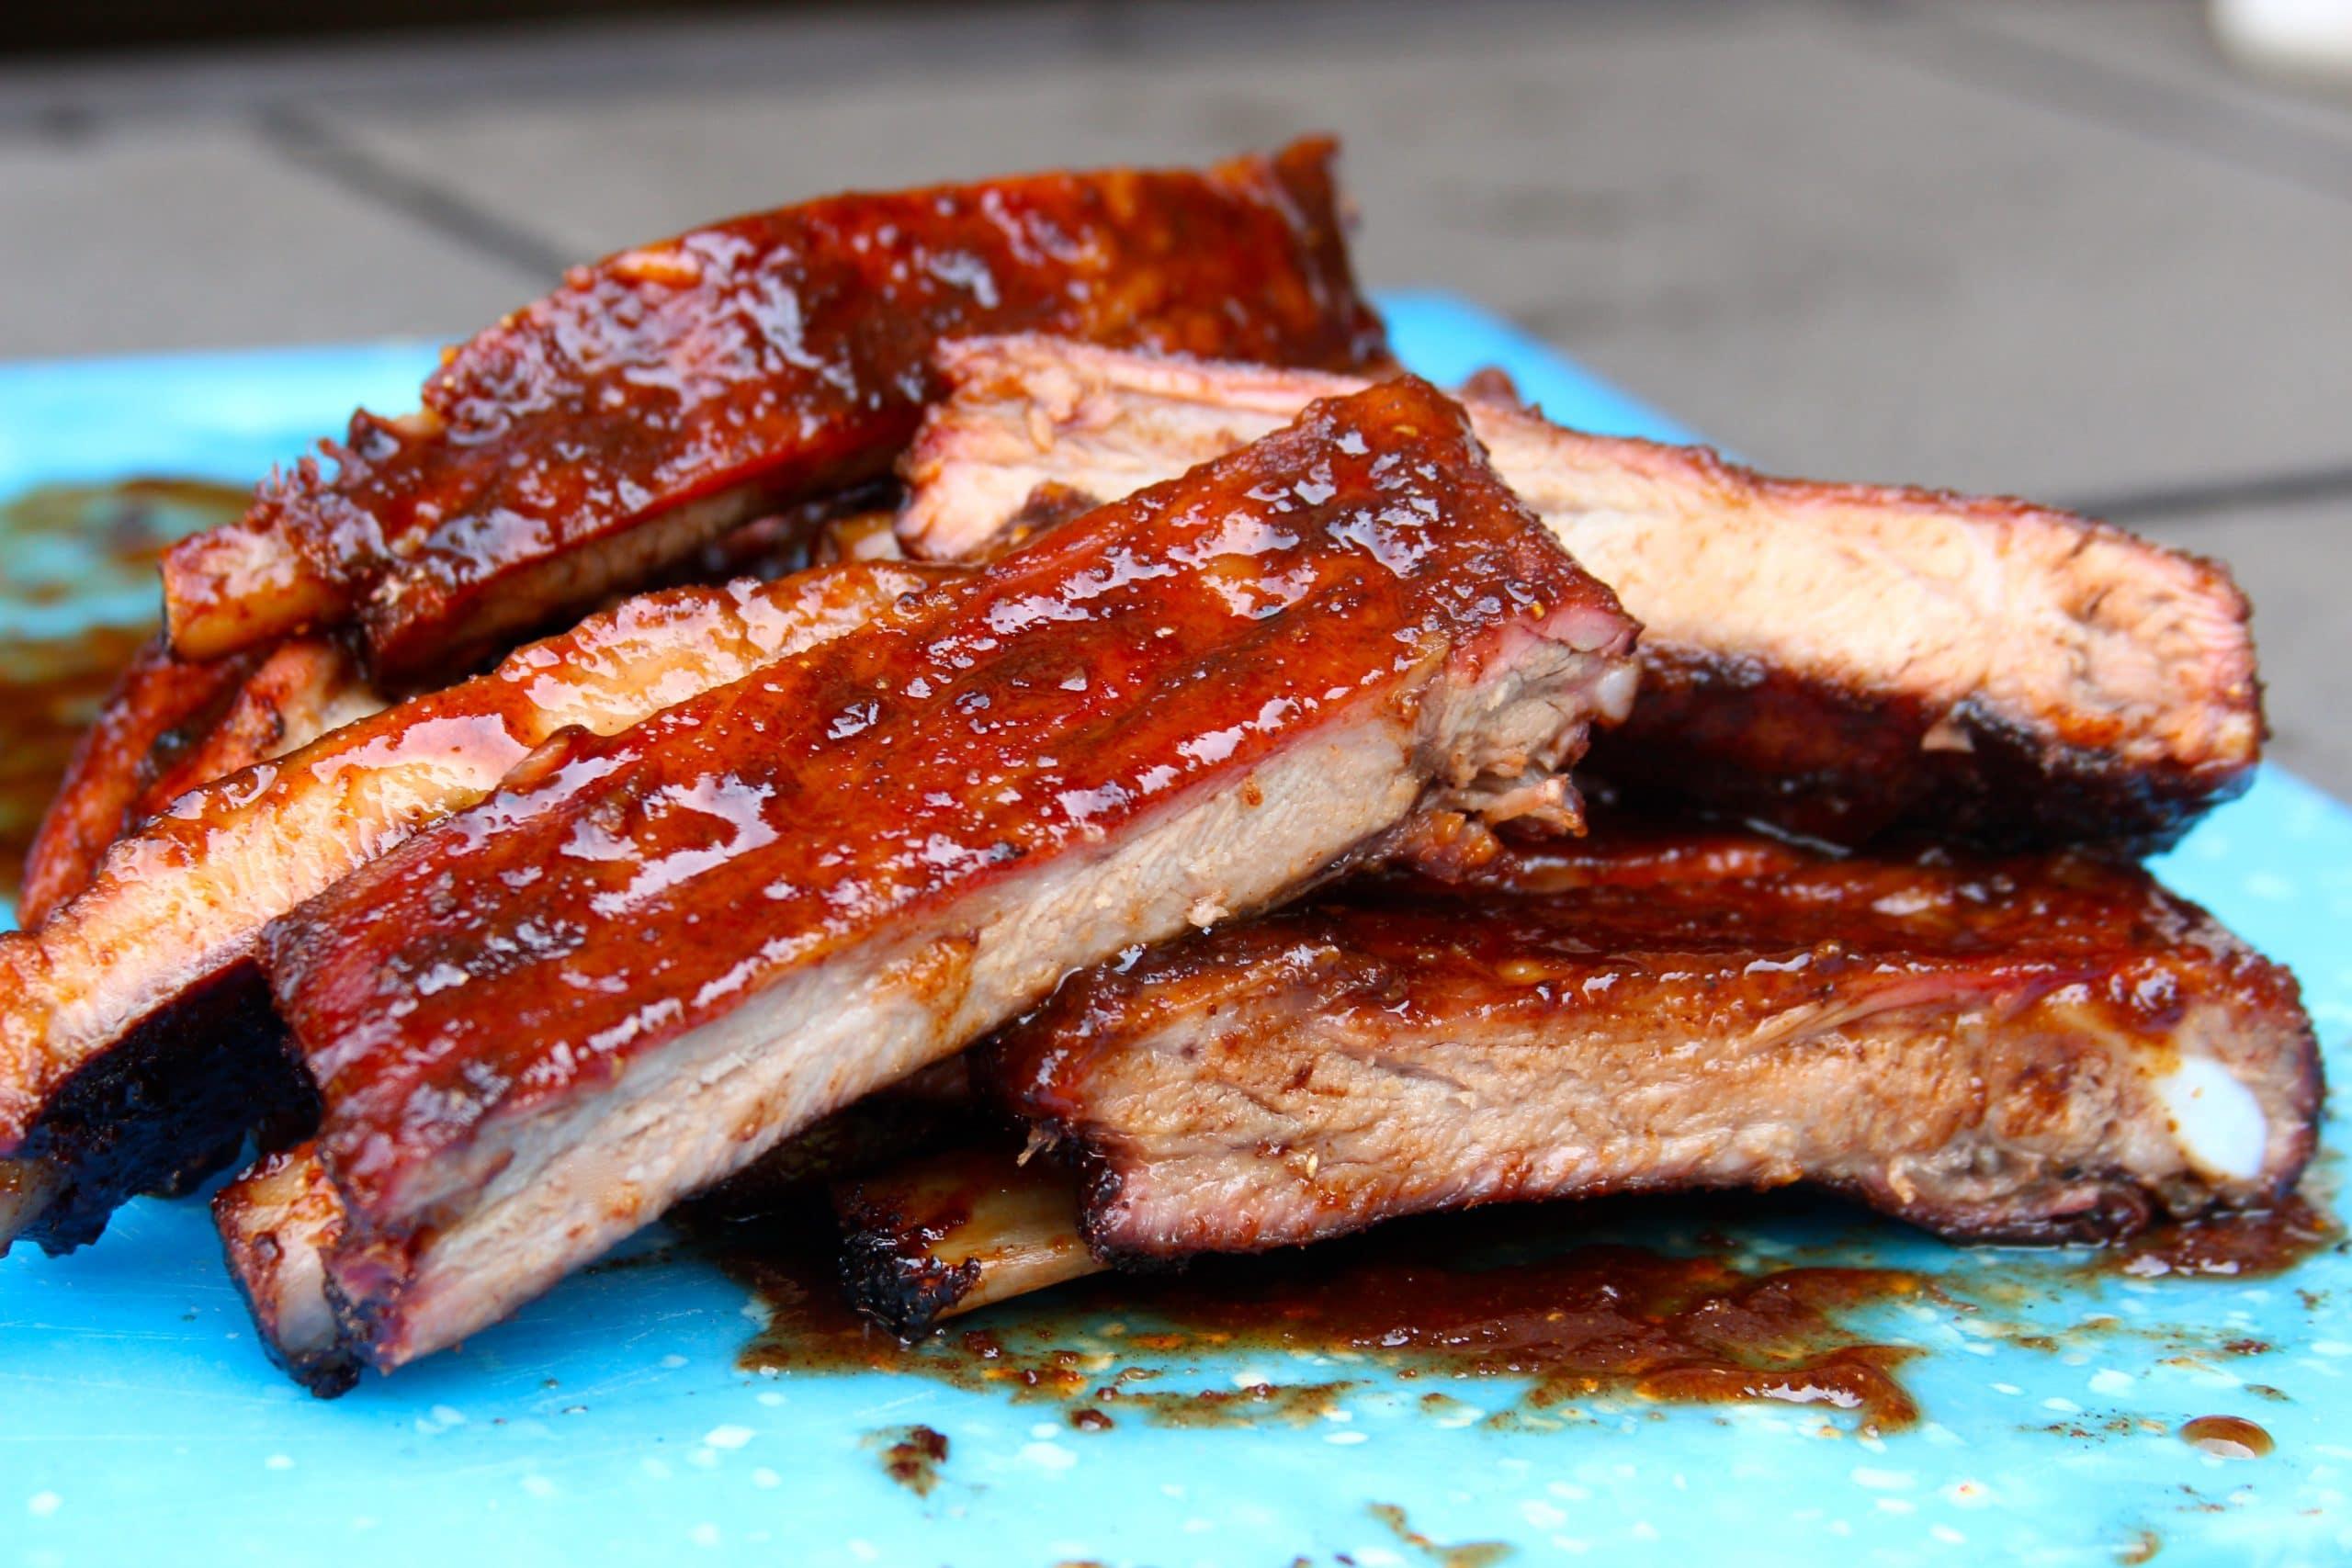 Soy-ginger glazed BBQ ribs